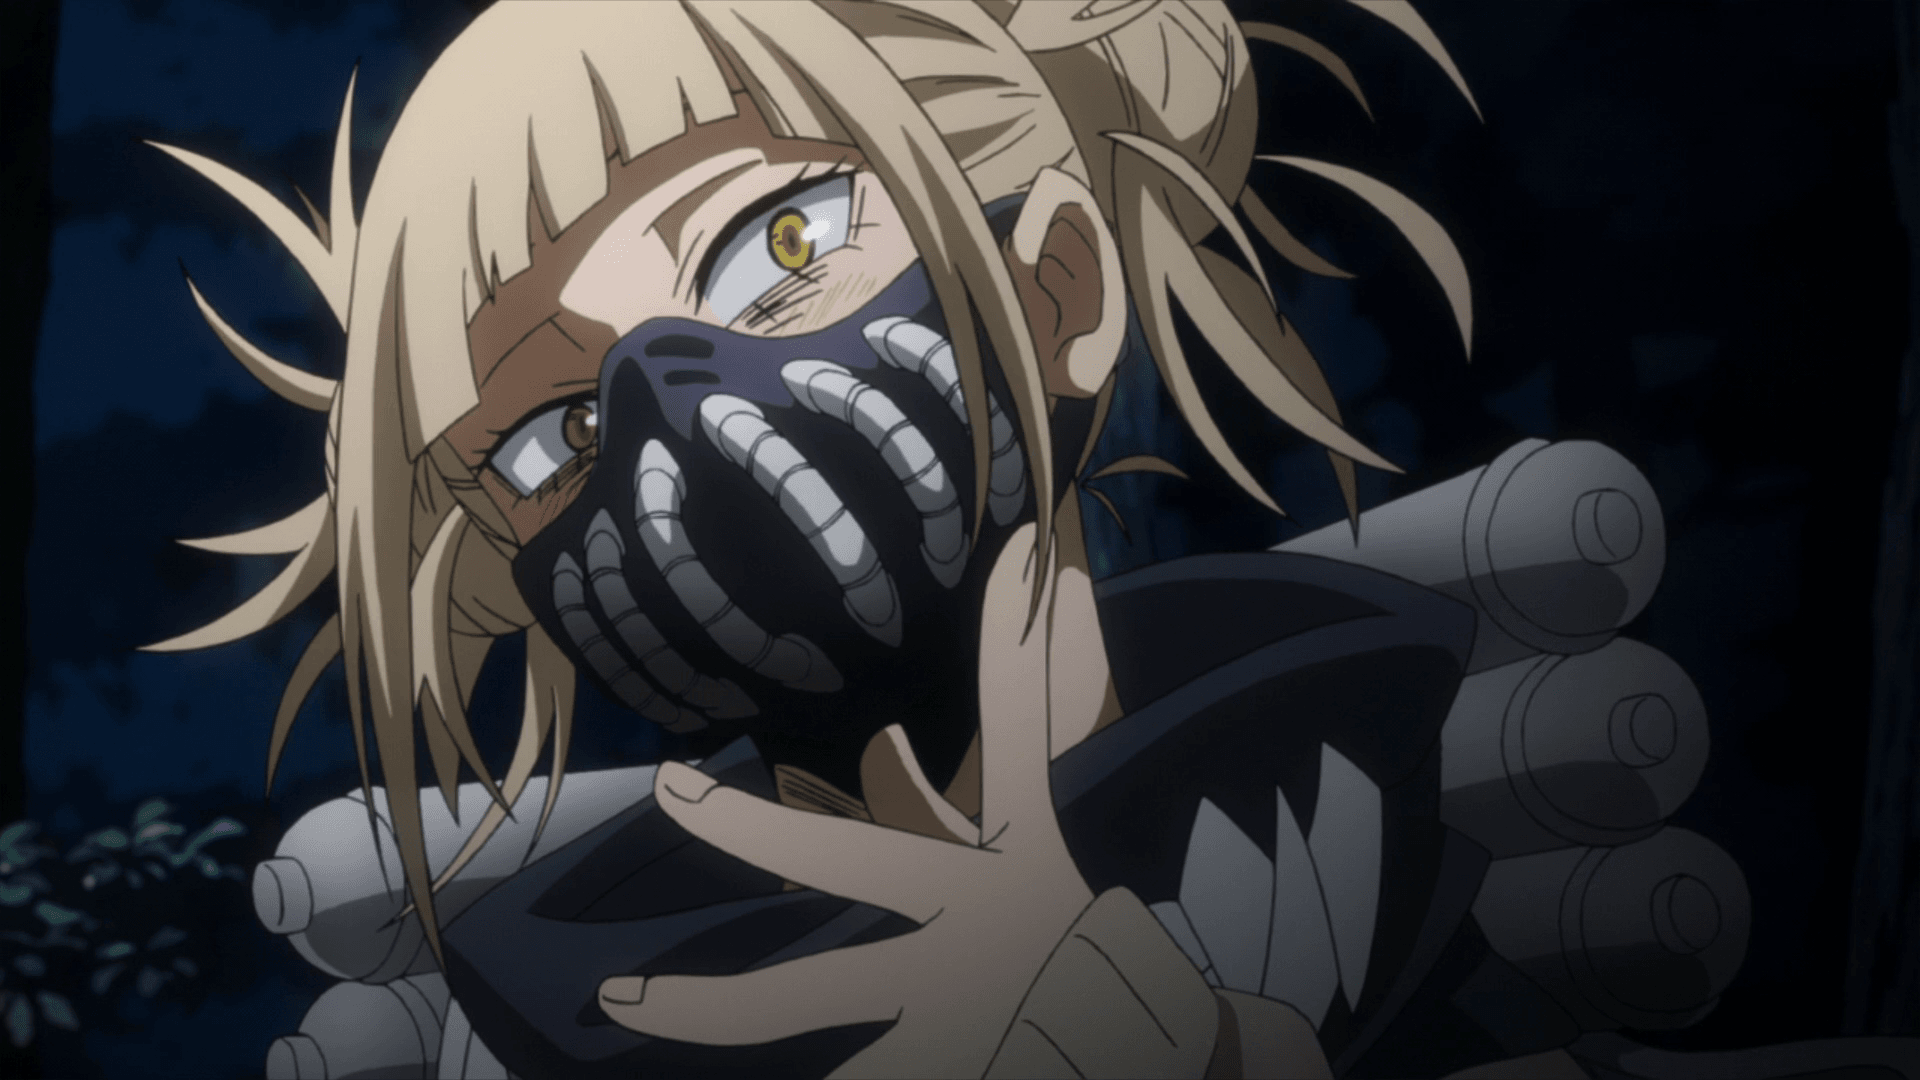 Scary My Hero Academia Cosplay Turns Himiko Toga Into A Living Nightmare Dexerto In 2020 Toga Anime My Hero Academia